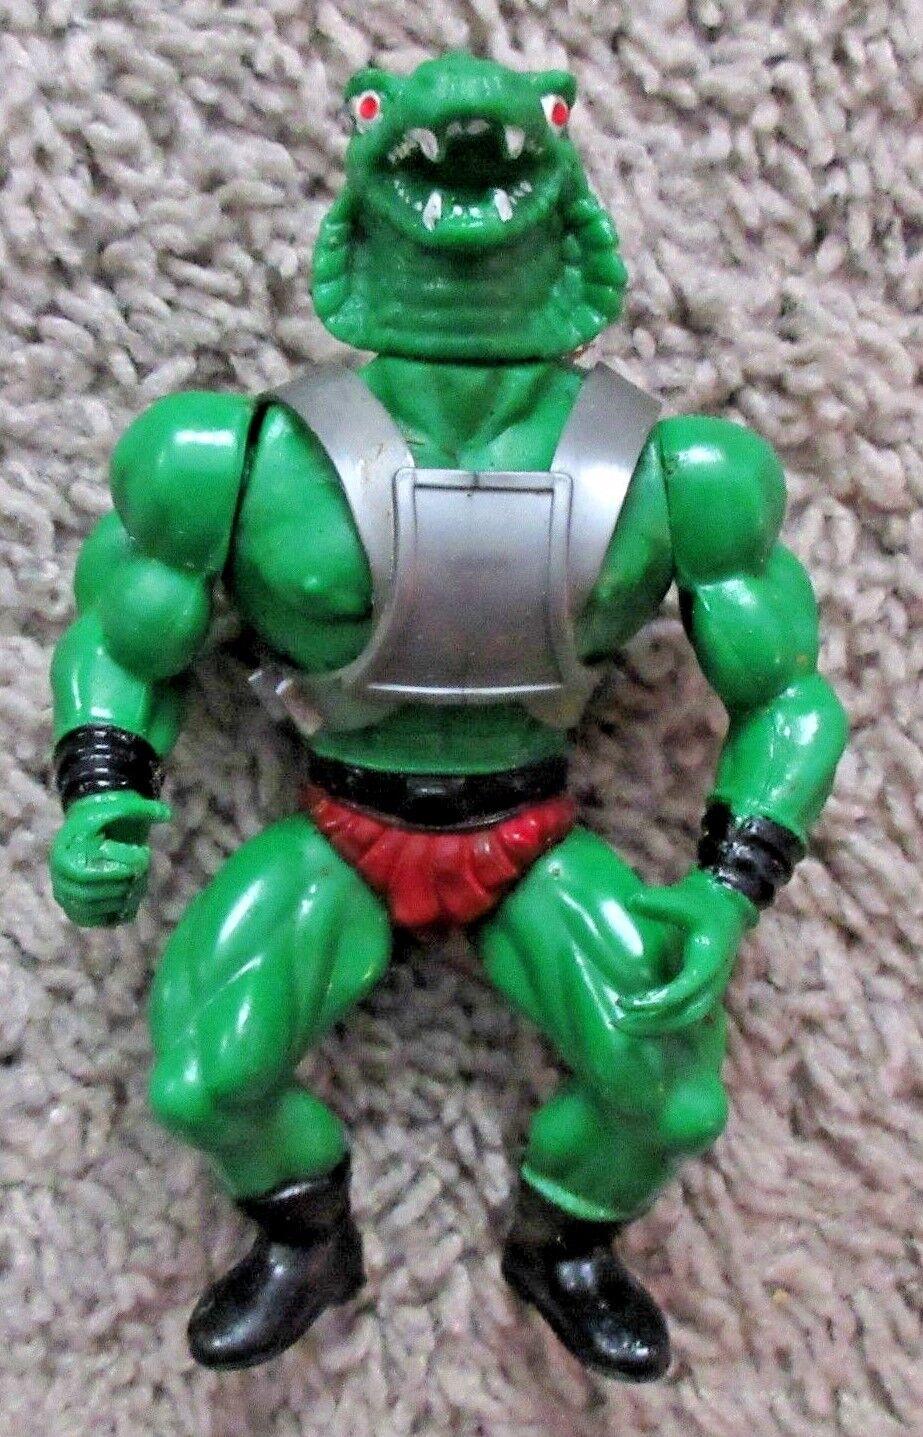 GALAXY HEROES SNAKE MAN WARRIORS KO MASTERS OF THE UNIVERSE HE-MAN MOTU